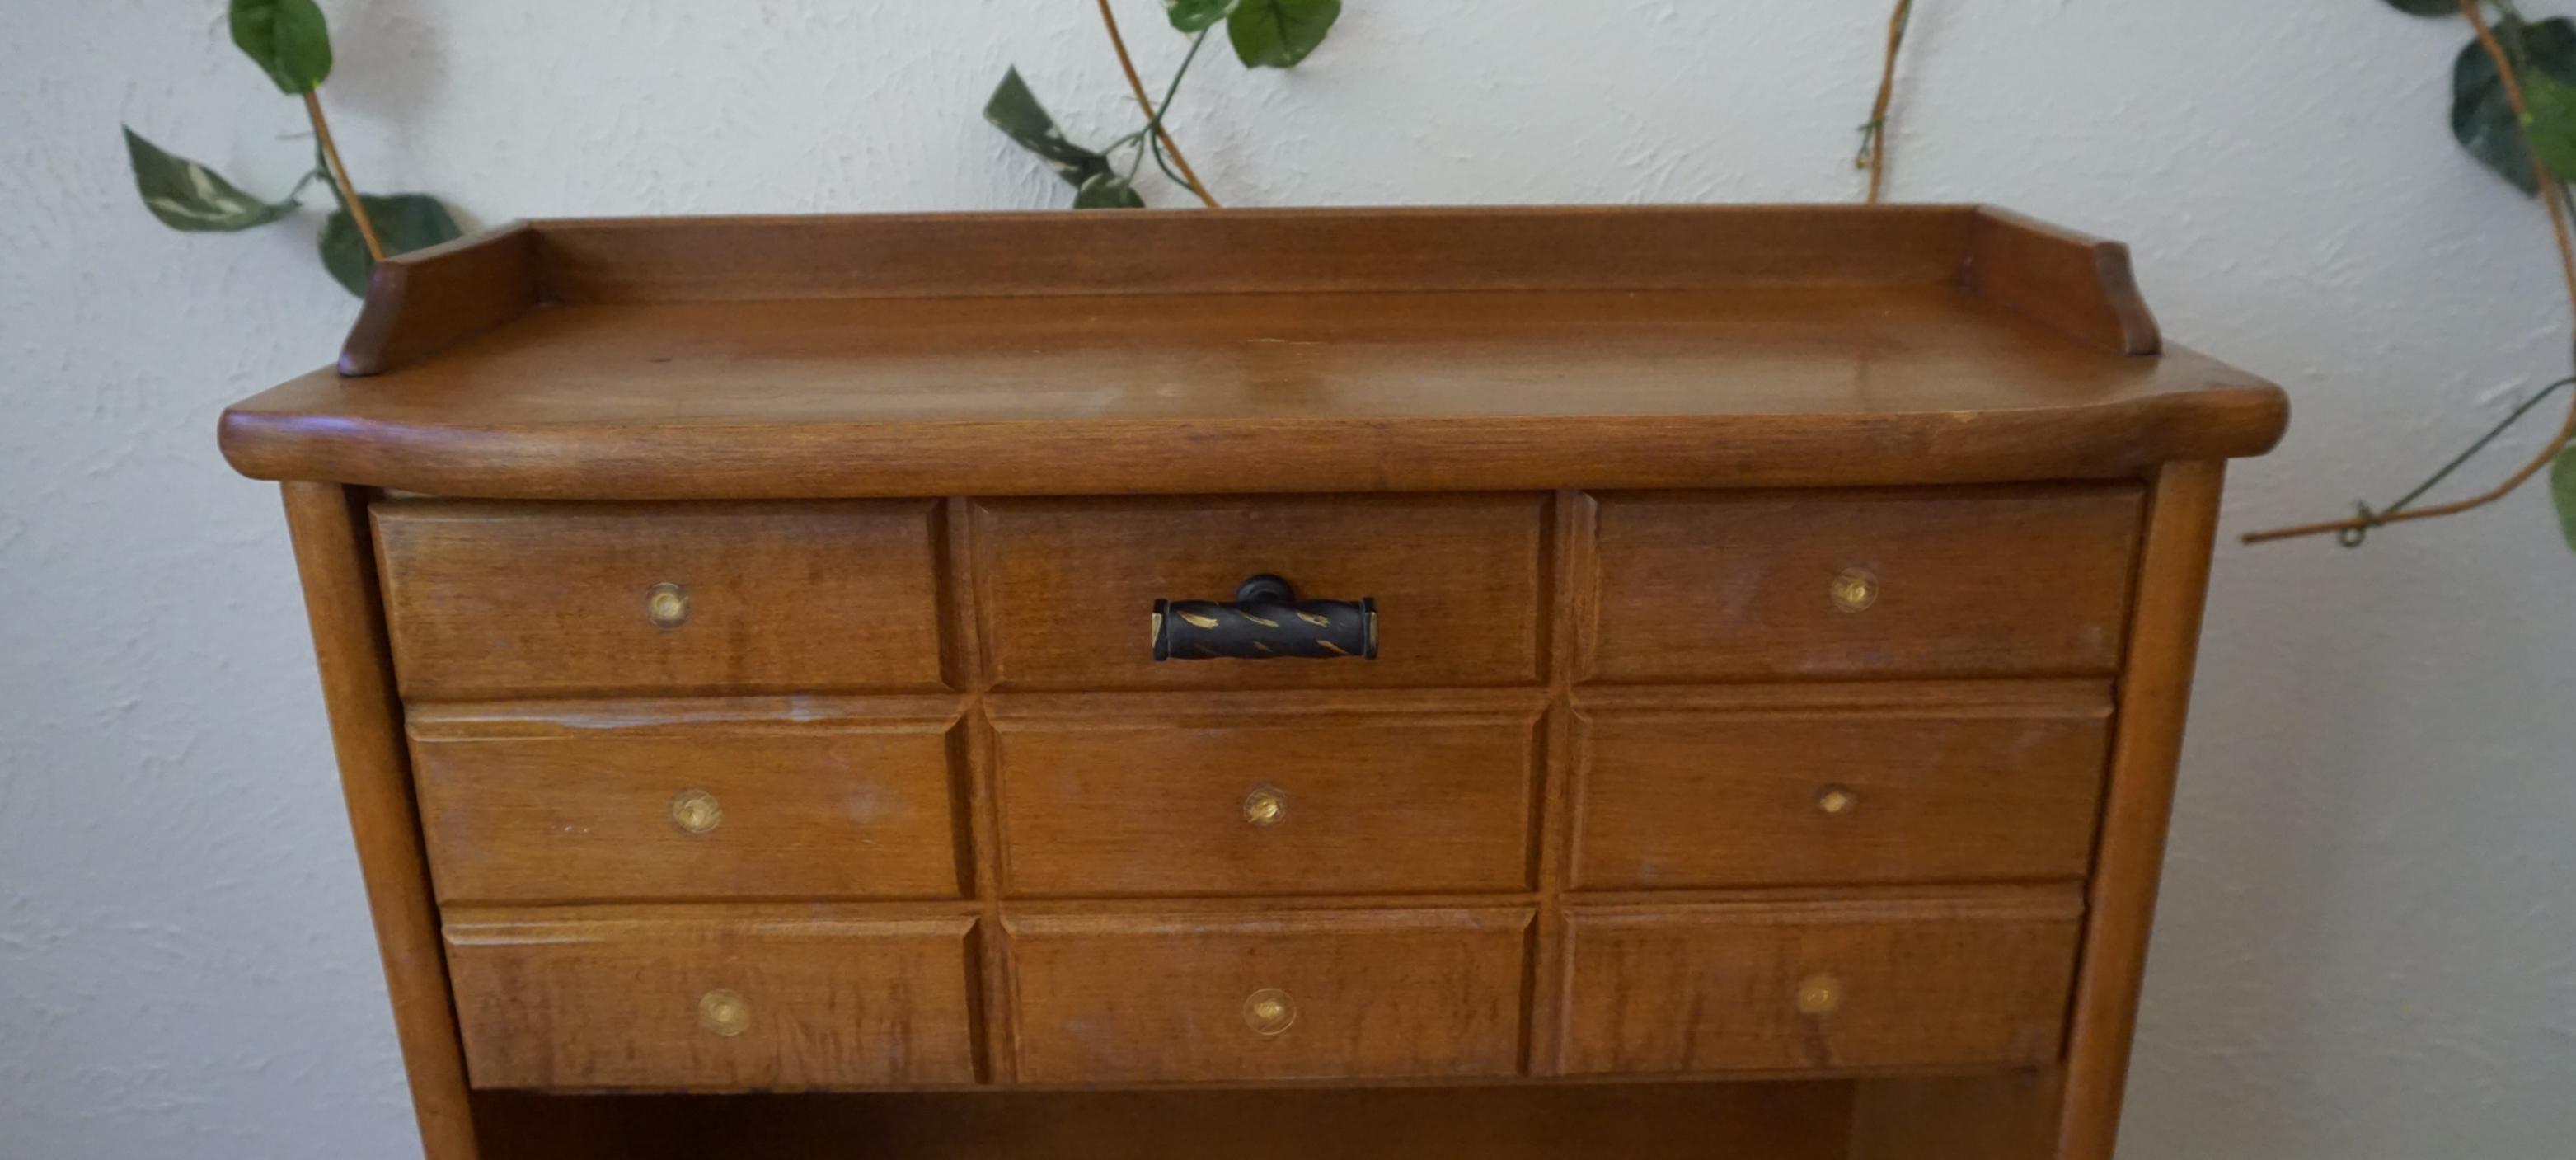 Thrift Store Decor – Minimalist DIY Furniture Upcycle